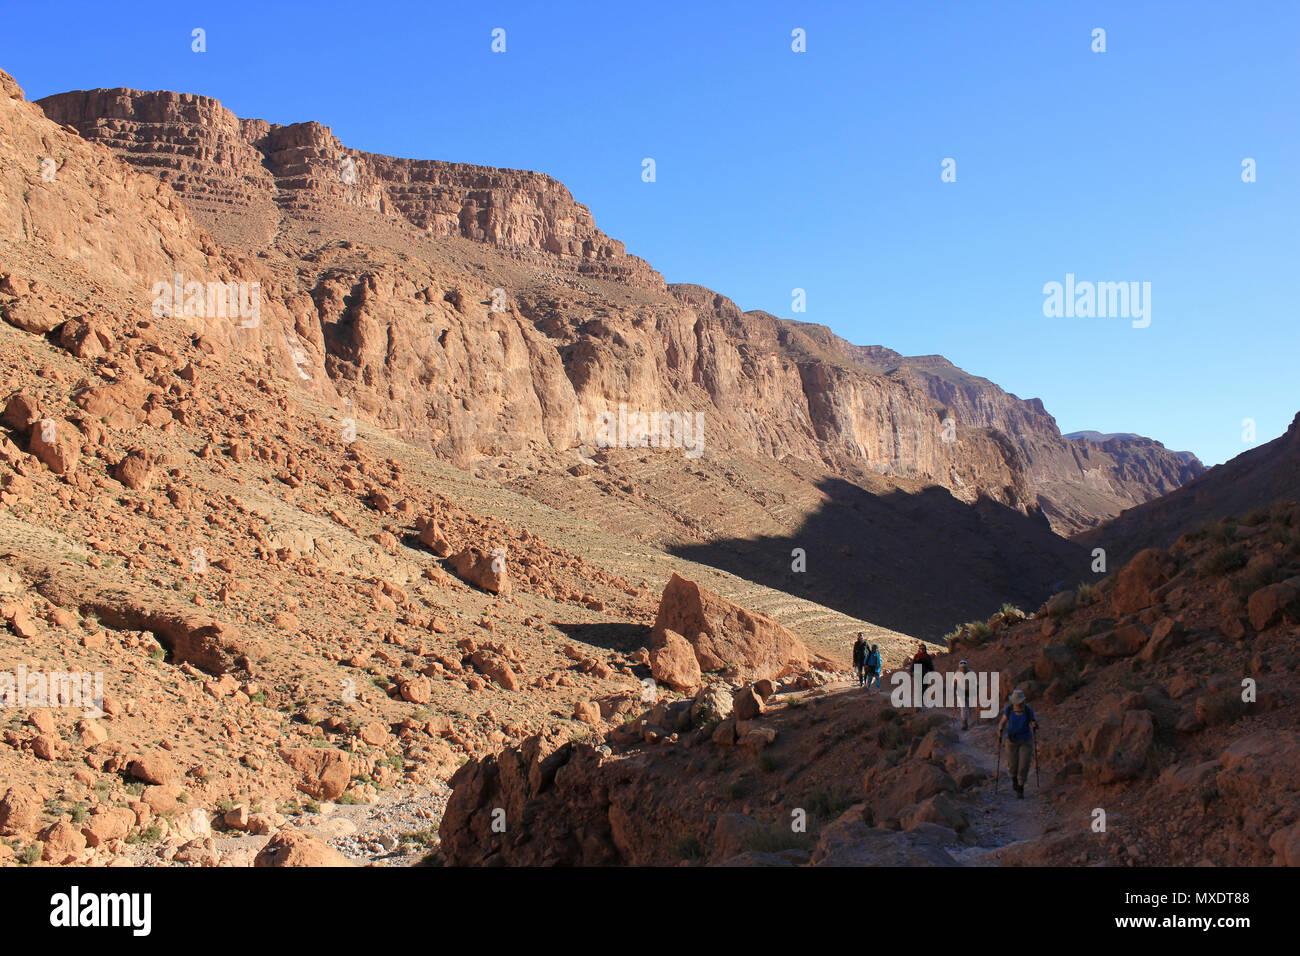 Randonnées dans la vallée de Todra Maroc Photo Stock